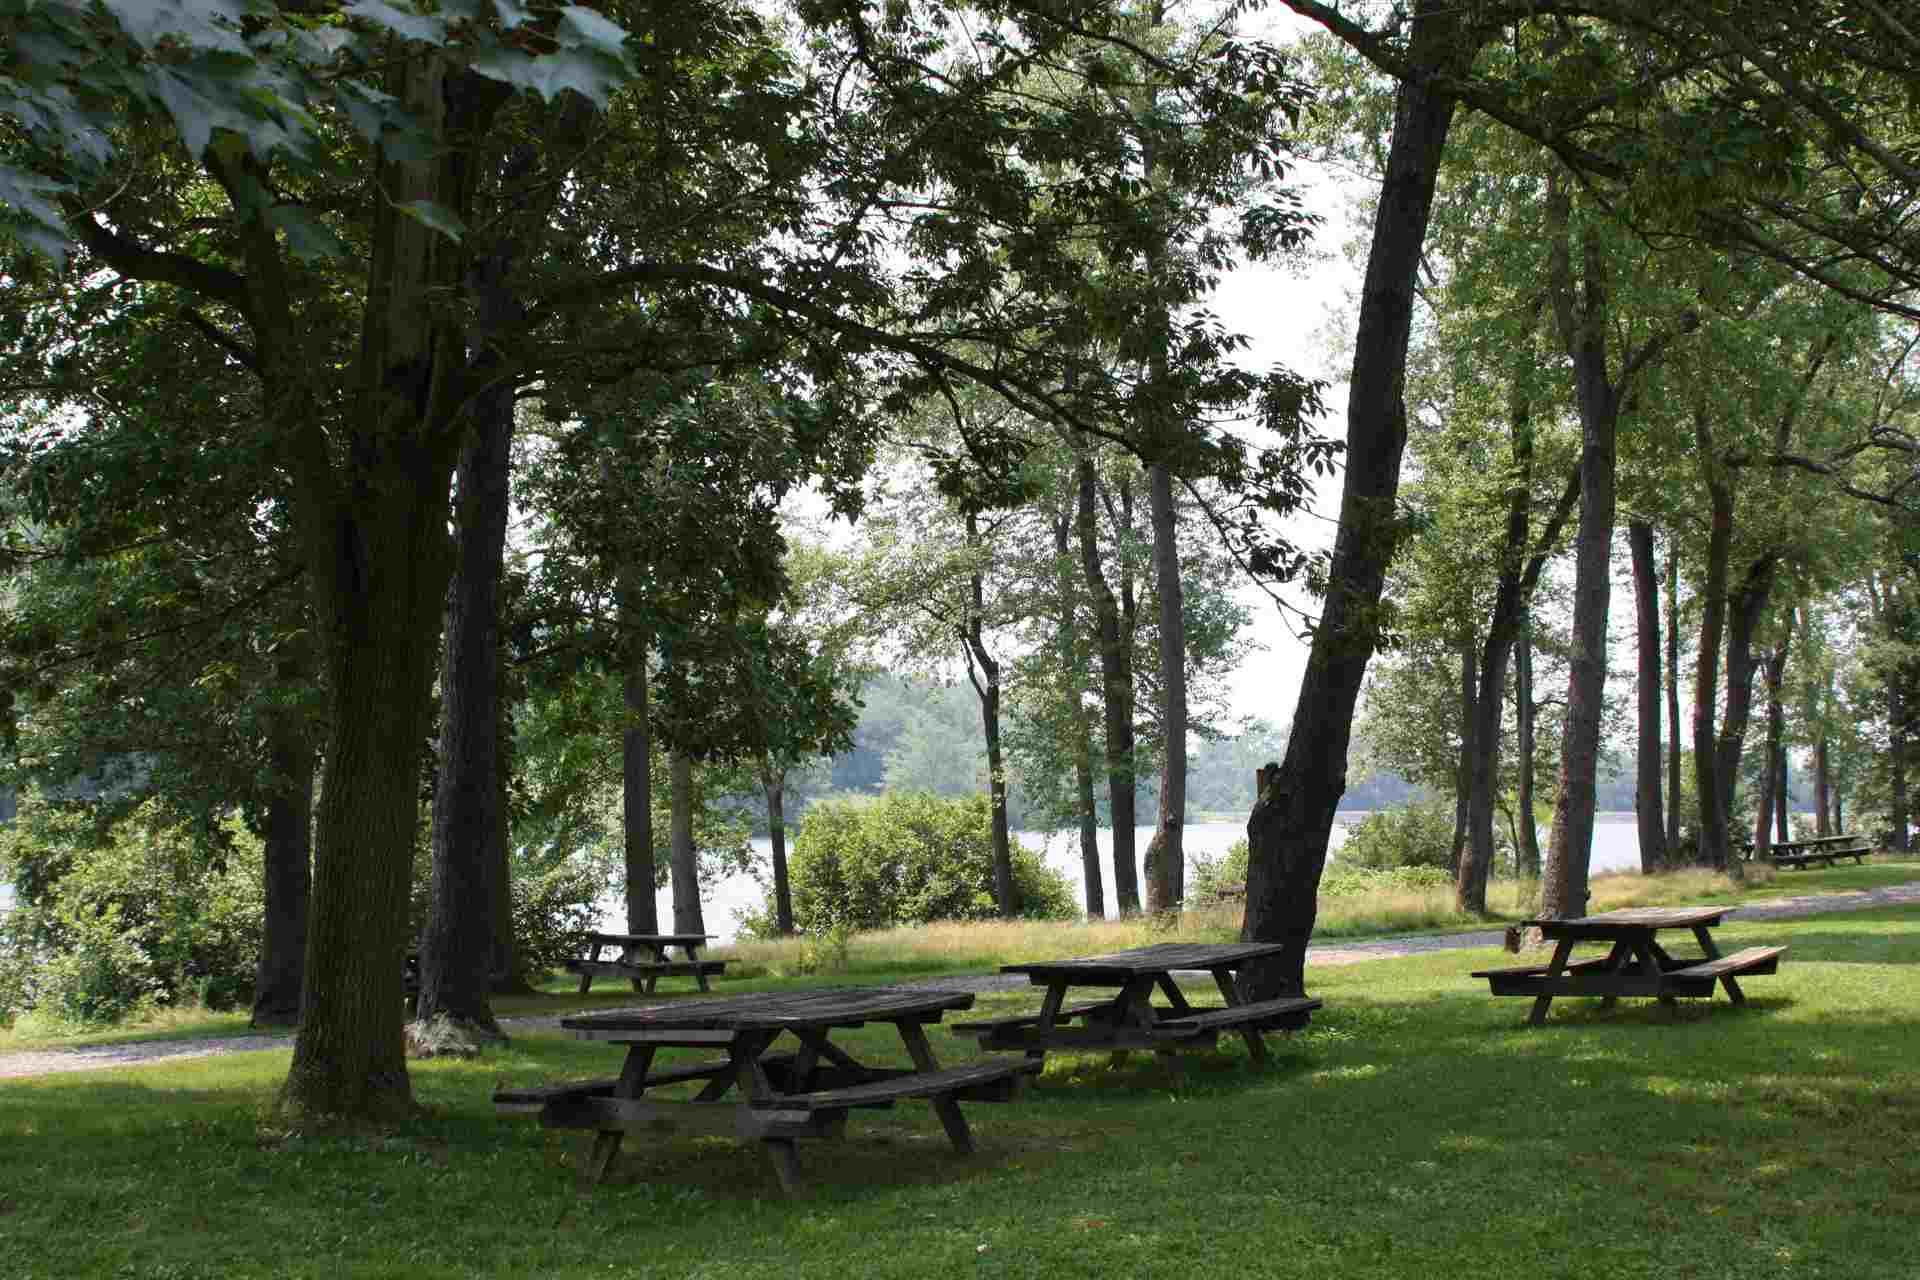 Keystone State Park picnic area